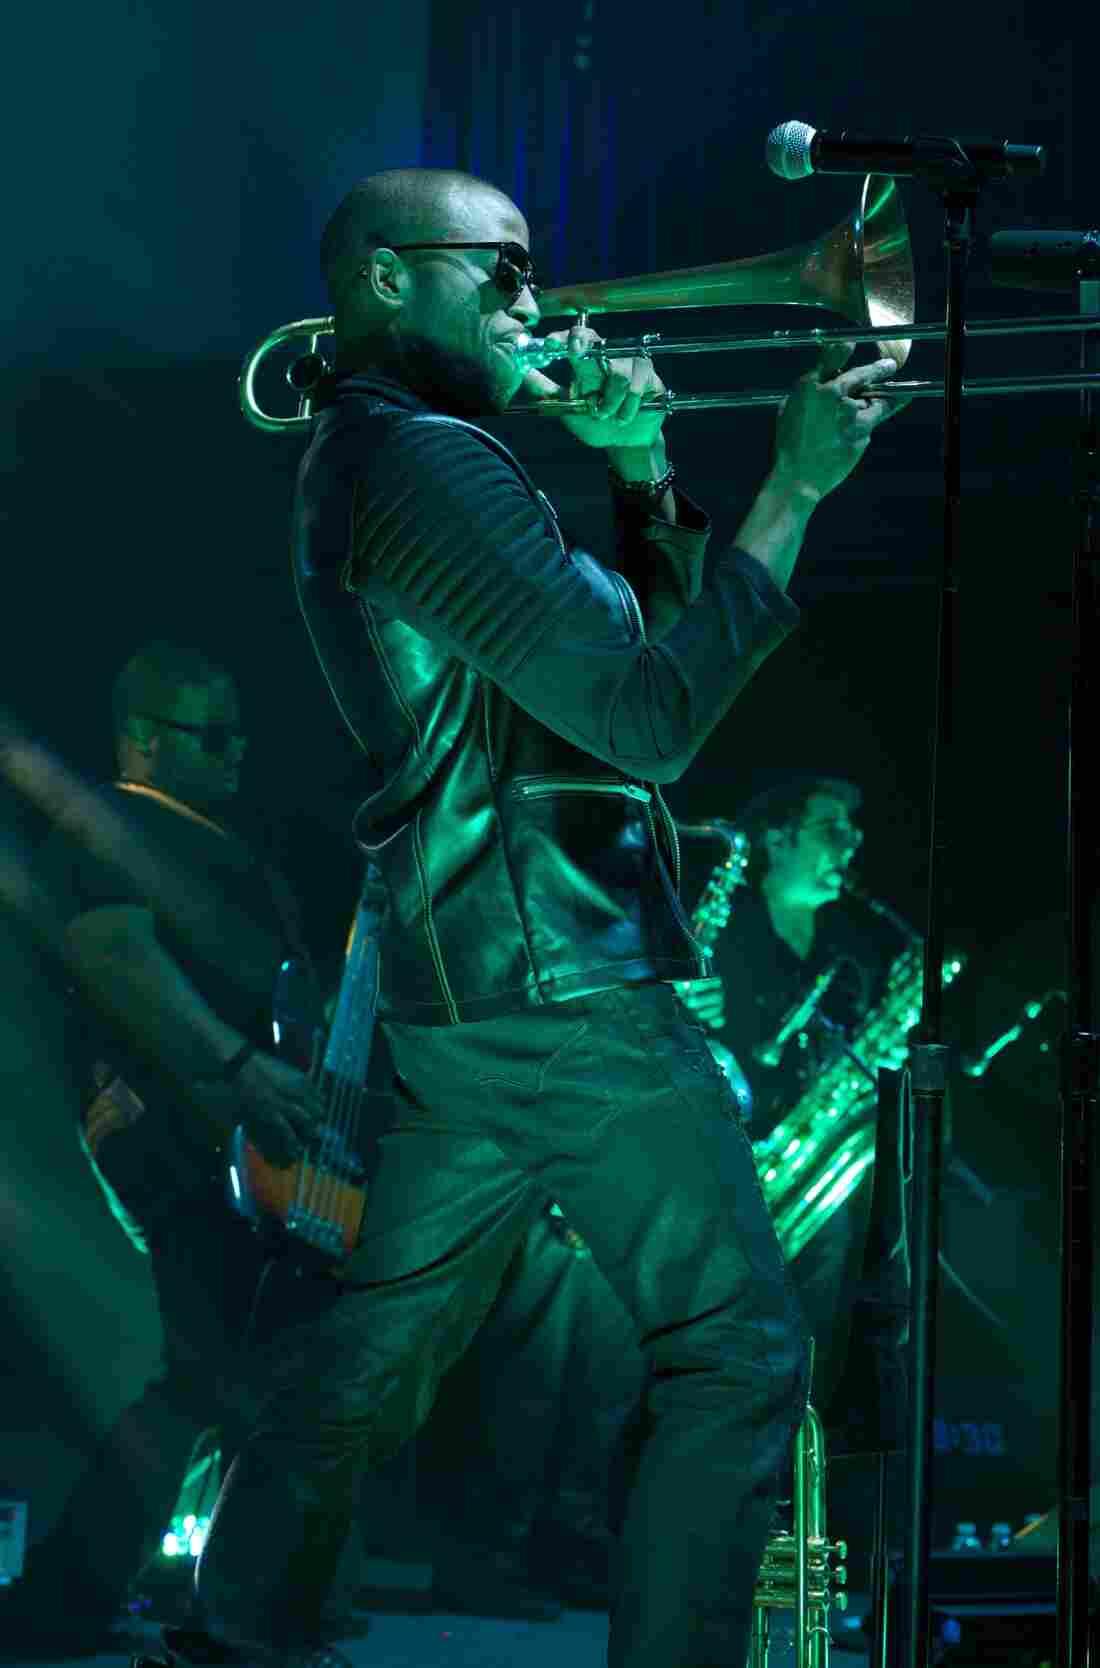 Trombone Shorty & Orleans Avenue 9:30 Club Washington, D.C. Photo by Bob Boilen for NPR Music